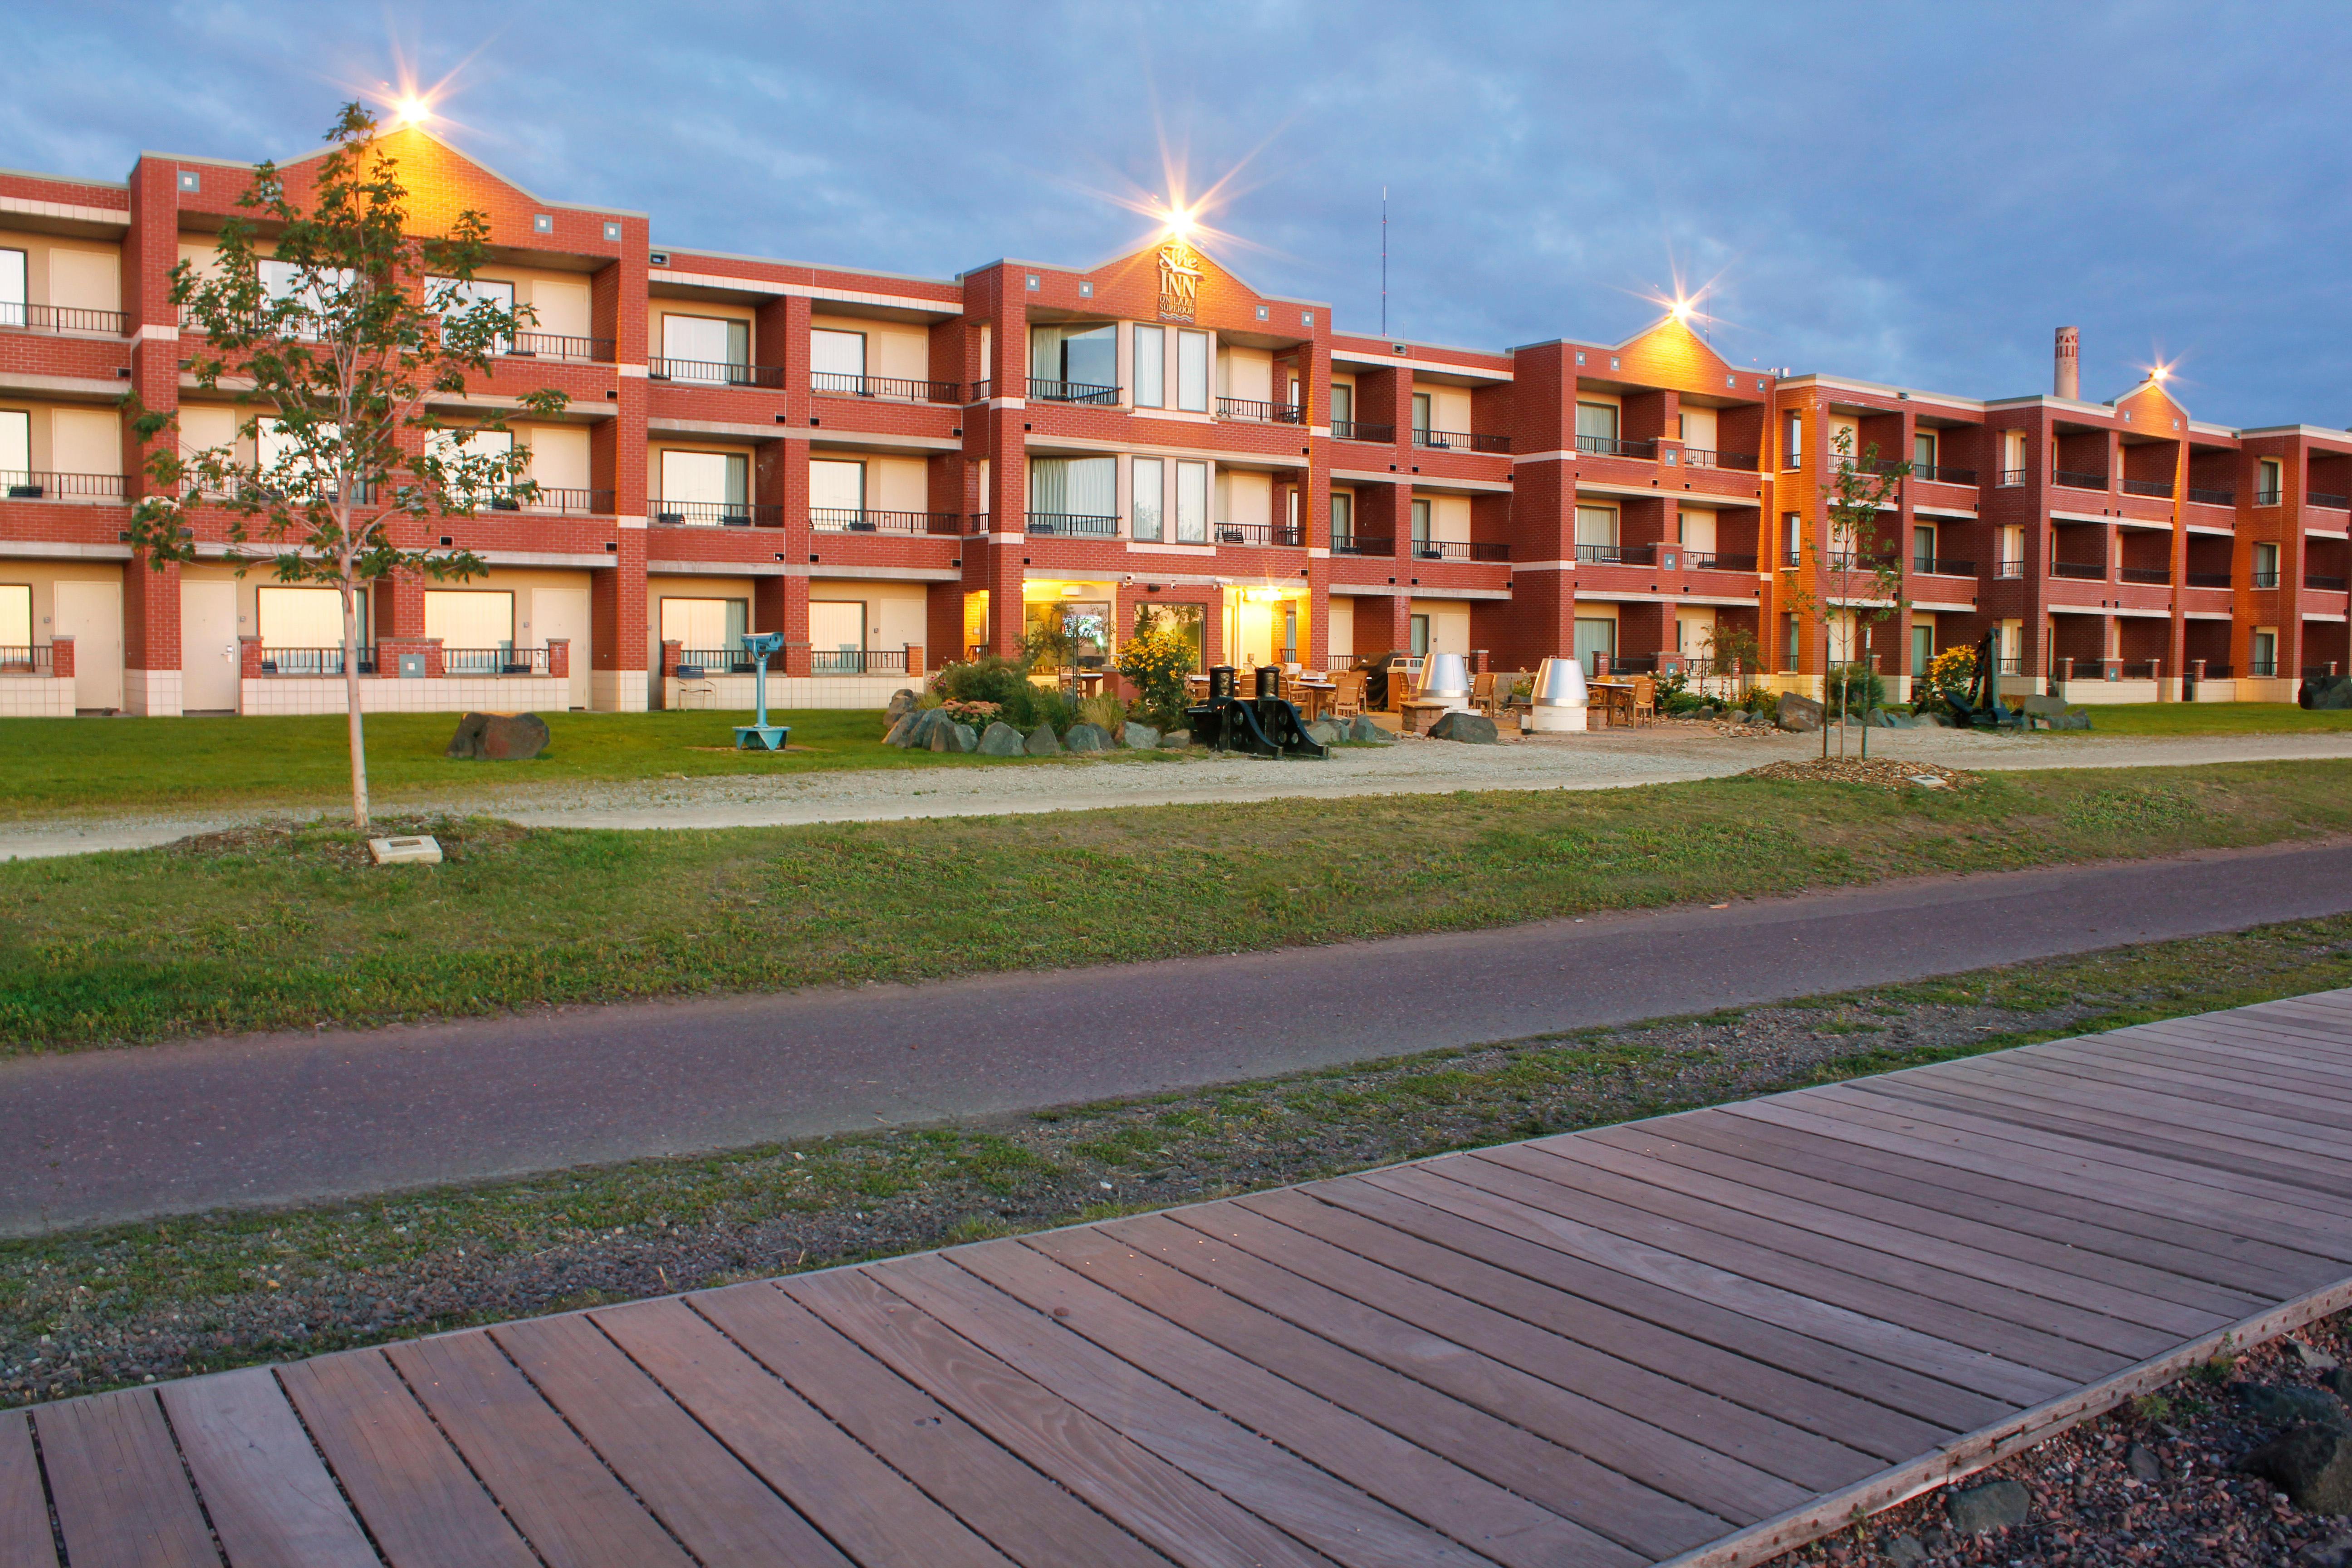 The Inn on Lake Superior image 0